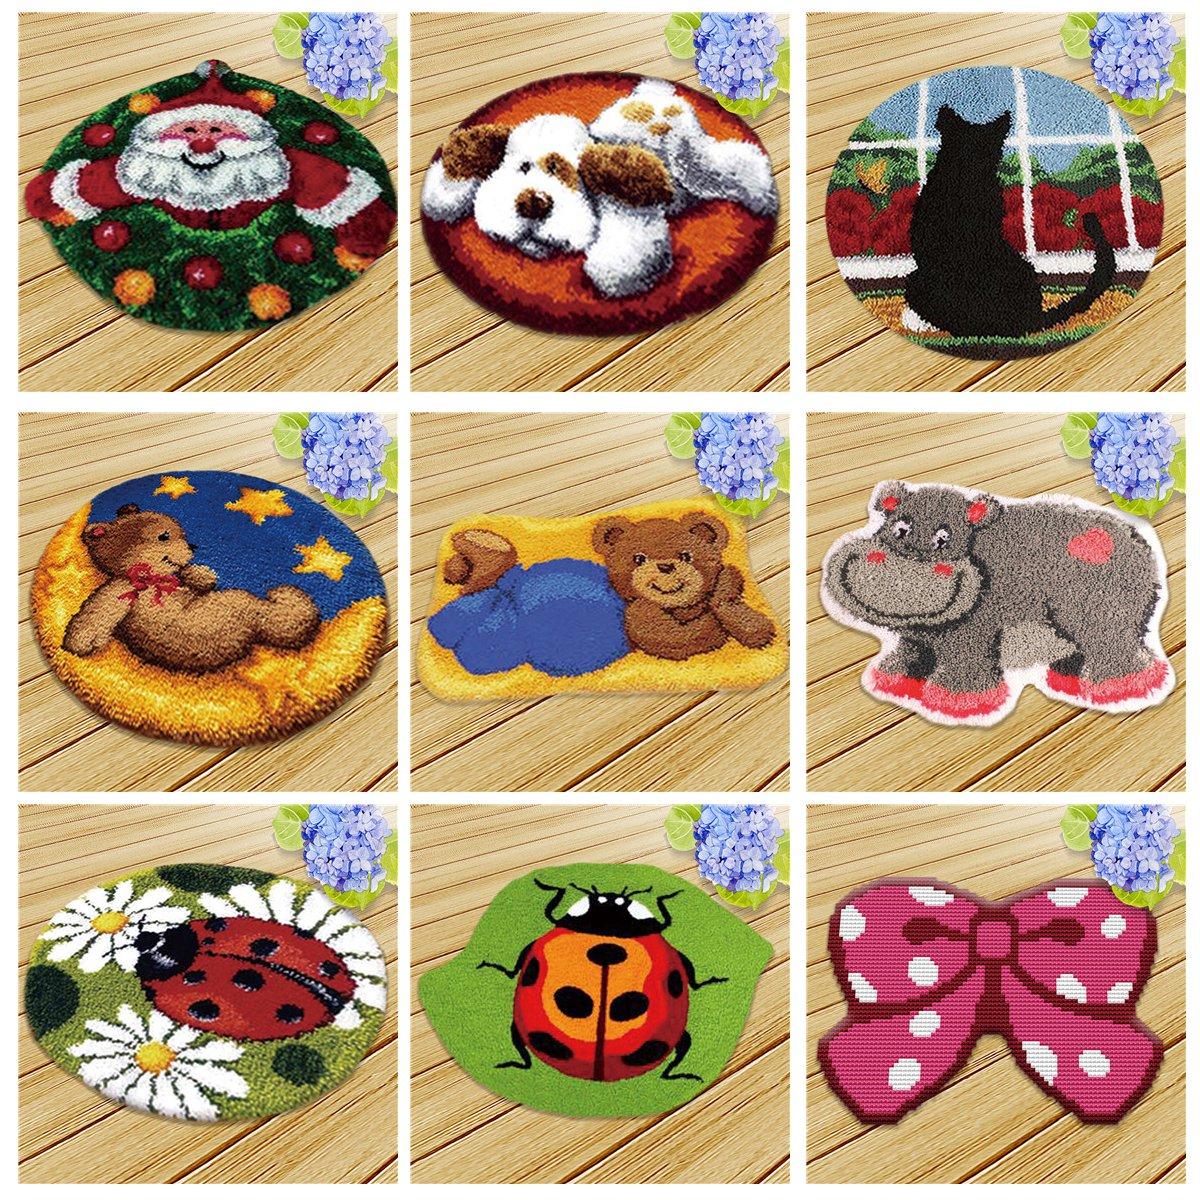 Bear, 20x20 inch Latch Hook Kit DIY Rug Carpet Handcraft Cushion Embroidery Set Crocheting for Kids /& Adults Animal//Flower Pattern